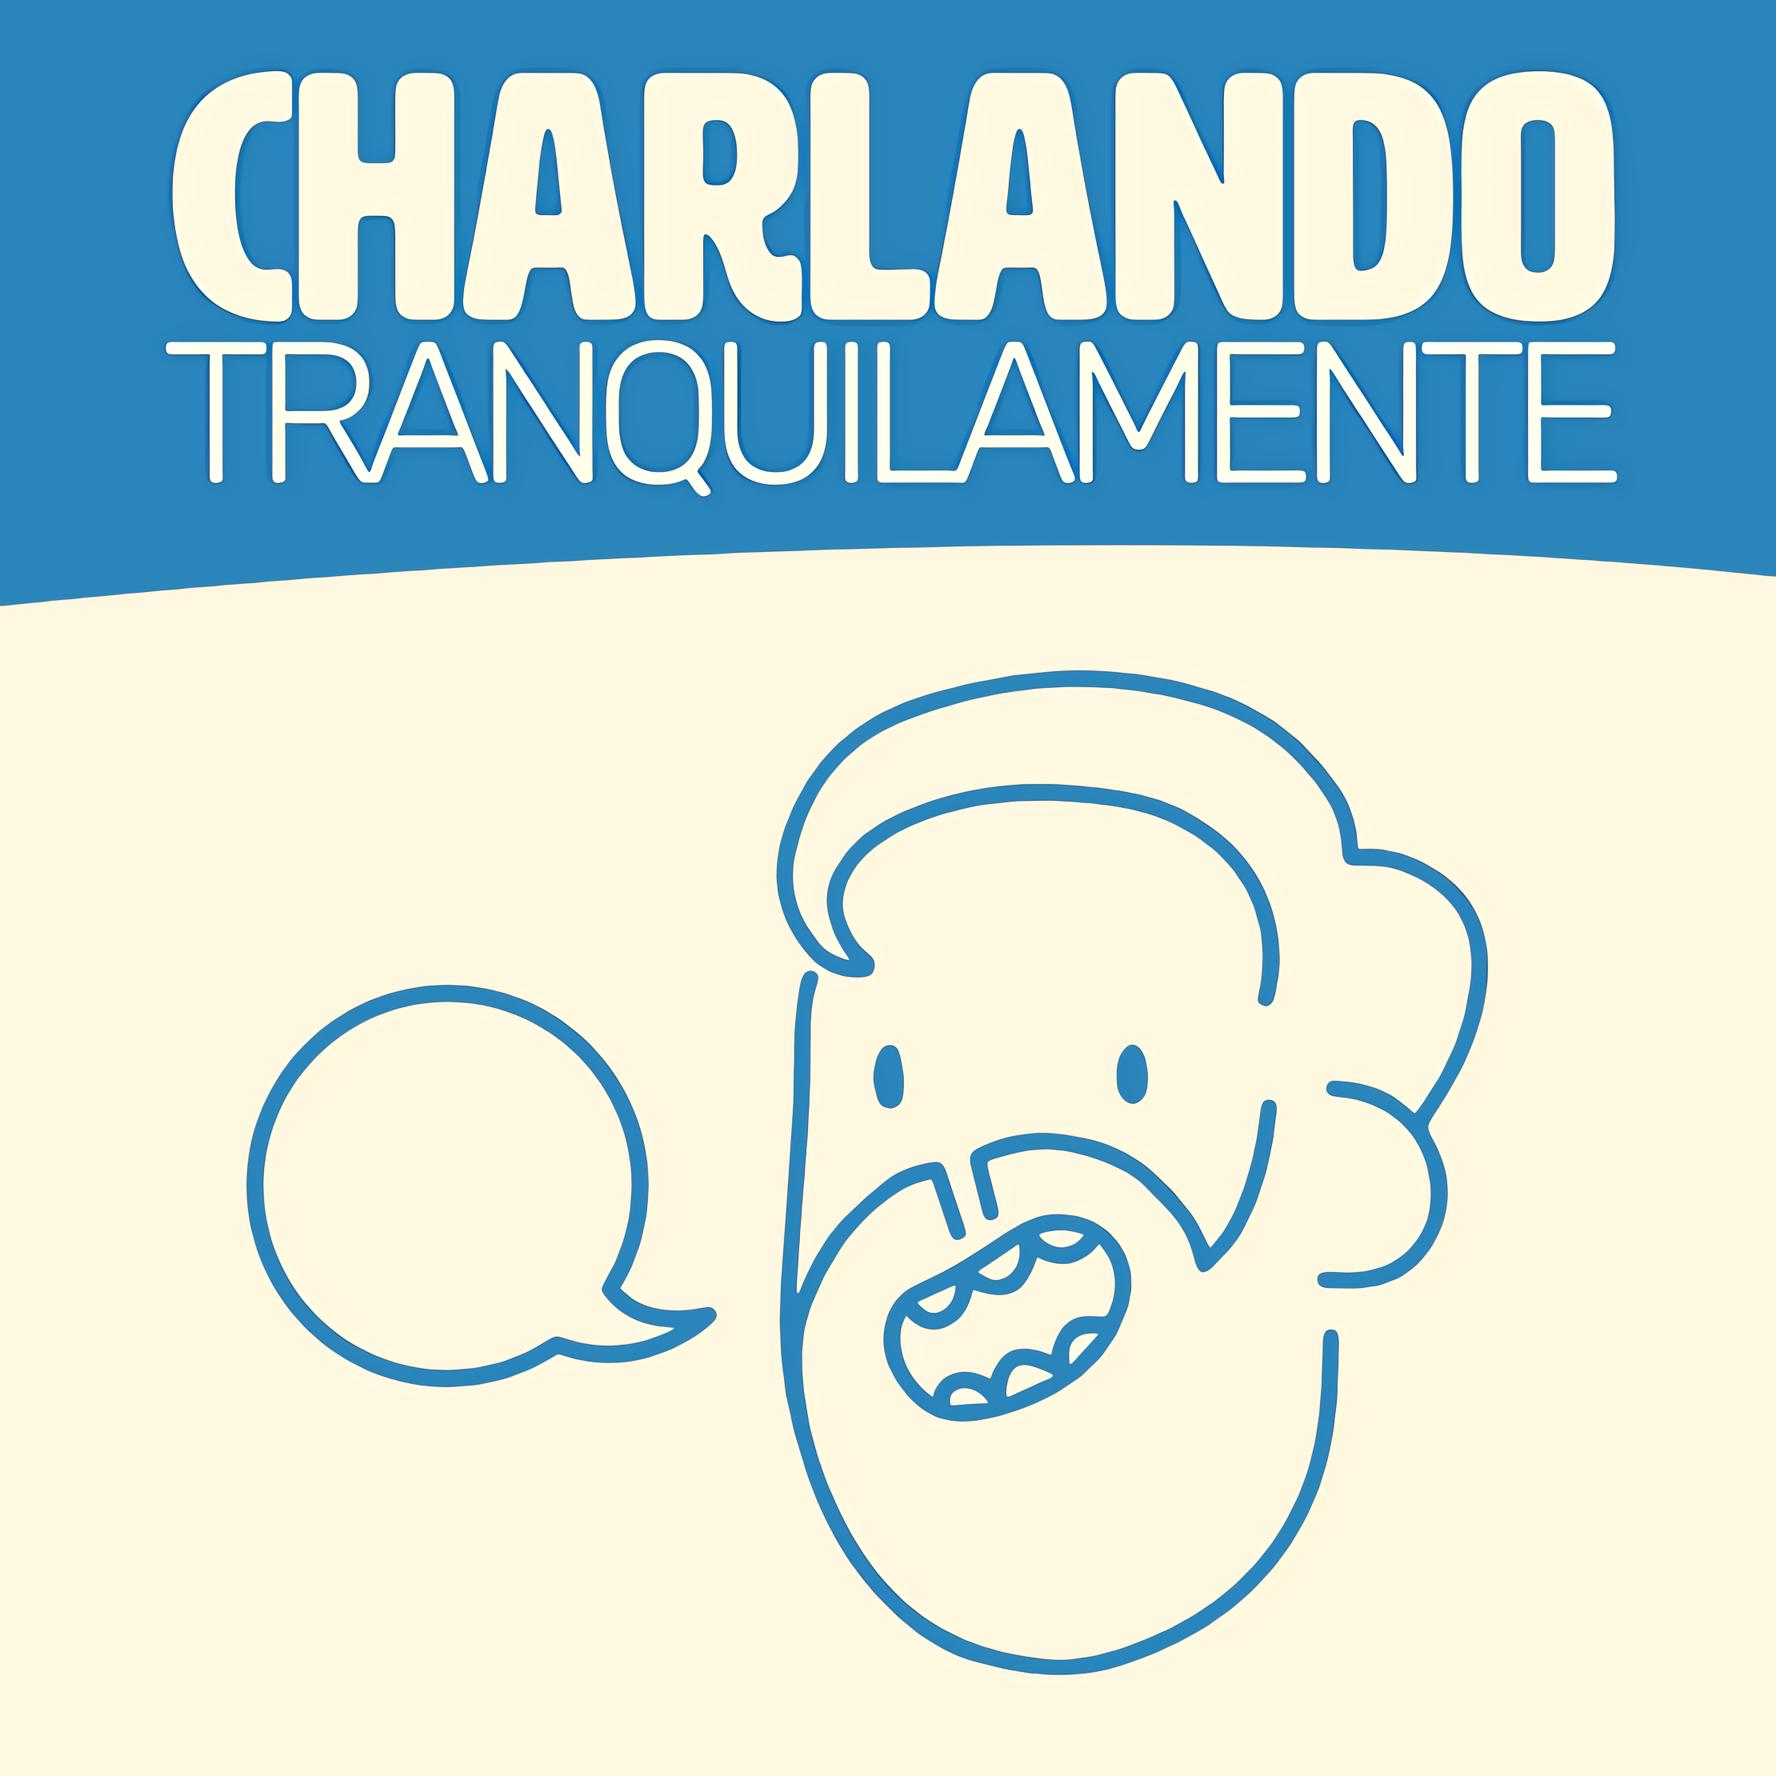 Charlando Tranquilamente #16 con RAUW ALEJANDRO